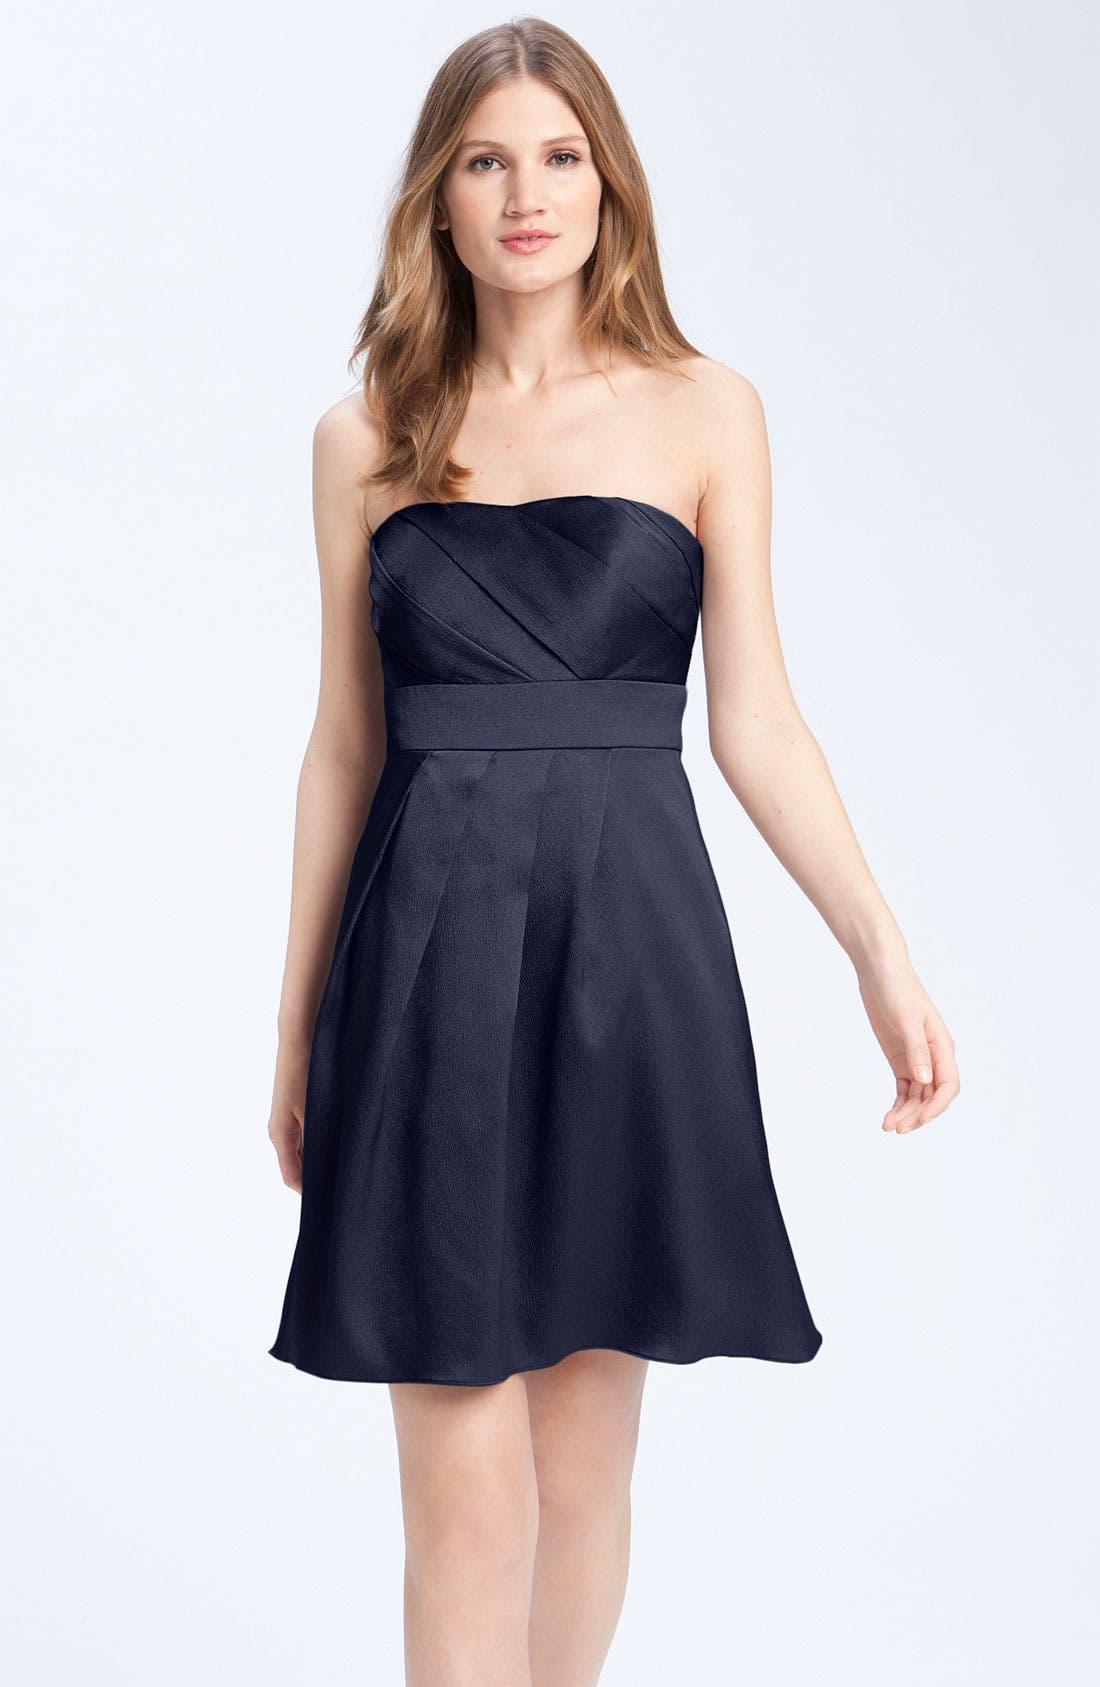 Alternate Image 1 Selected - Jenny Yoo Hammered Satin Strapless Dress